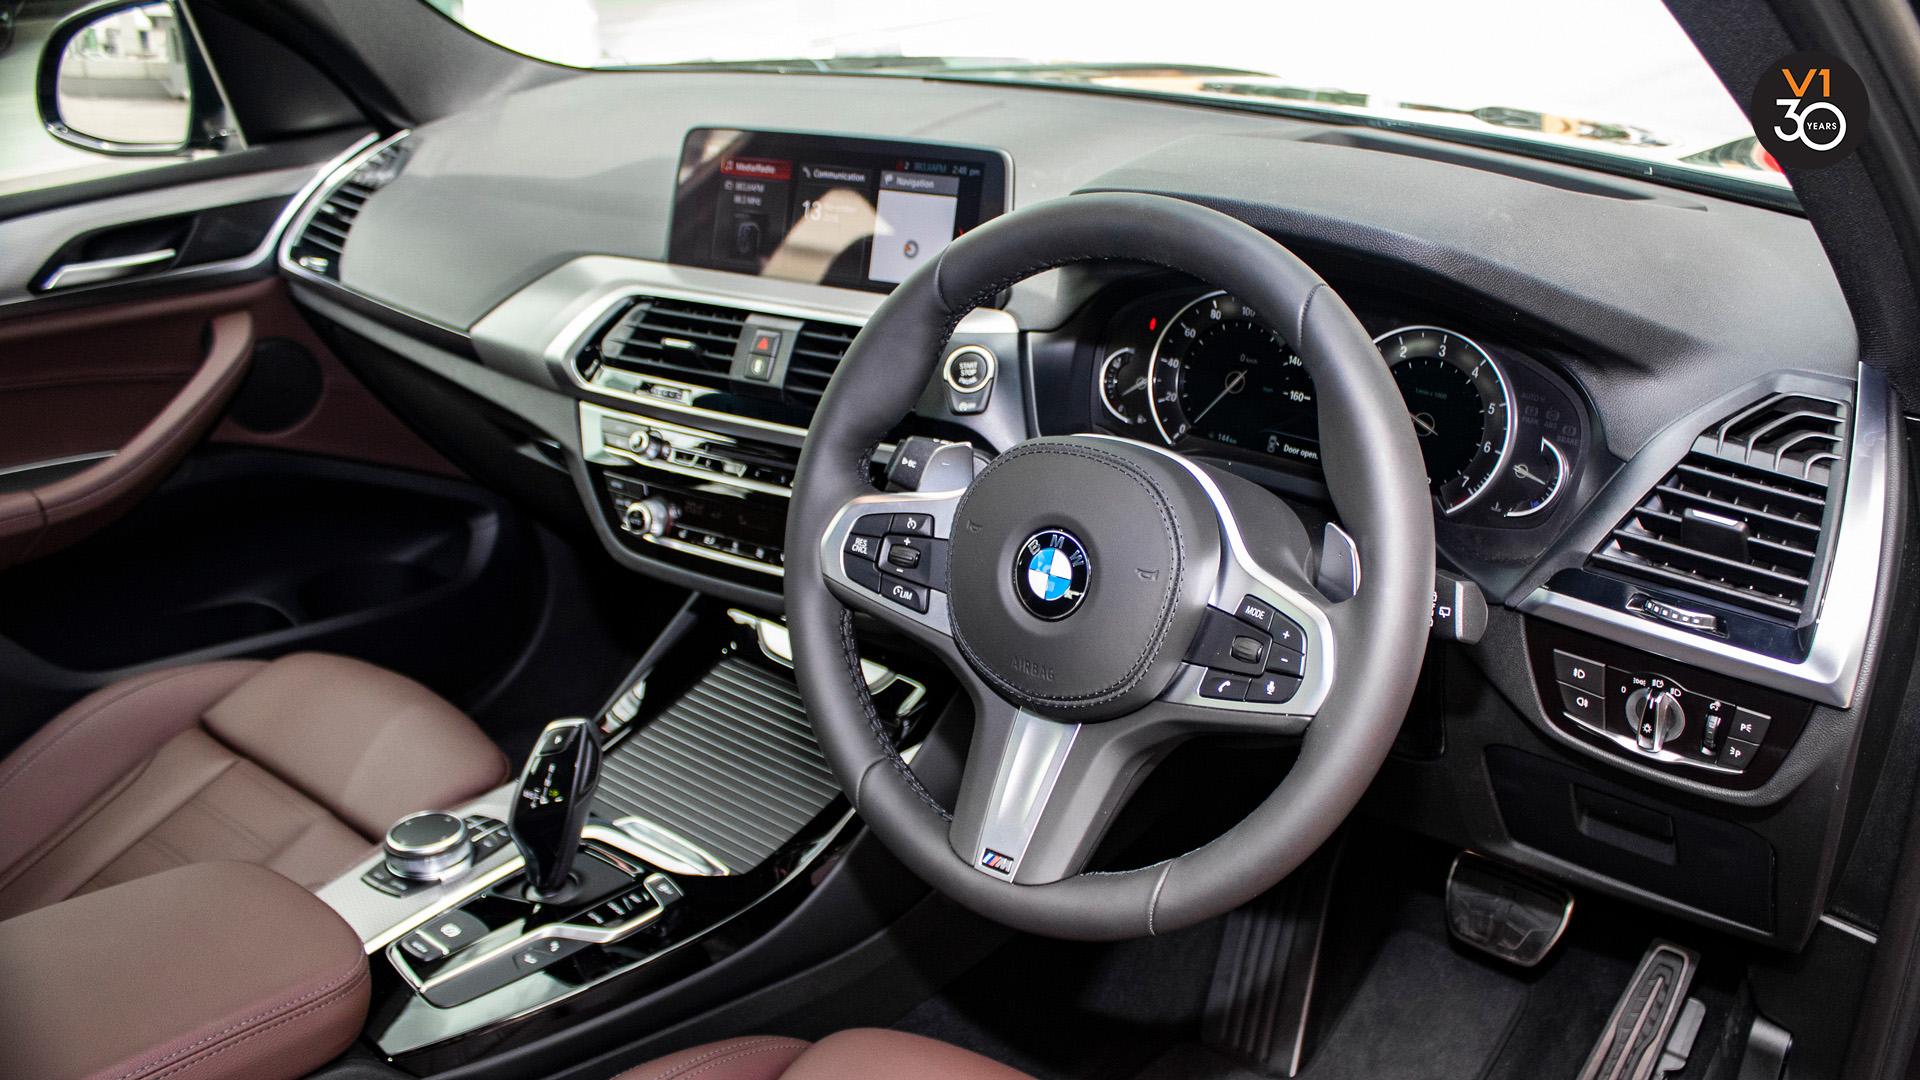 BMW X3 XDrive 2.0I M Sport - Steering Wheel